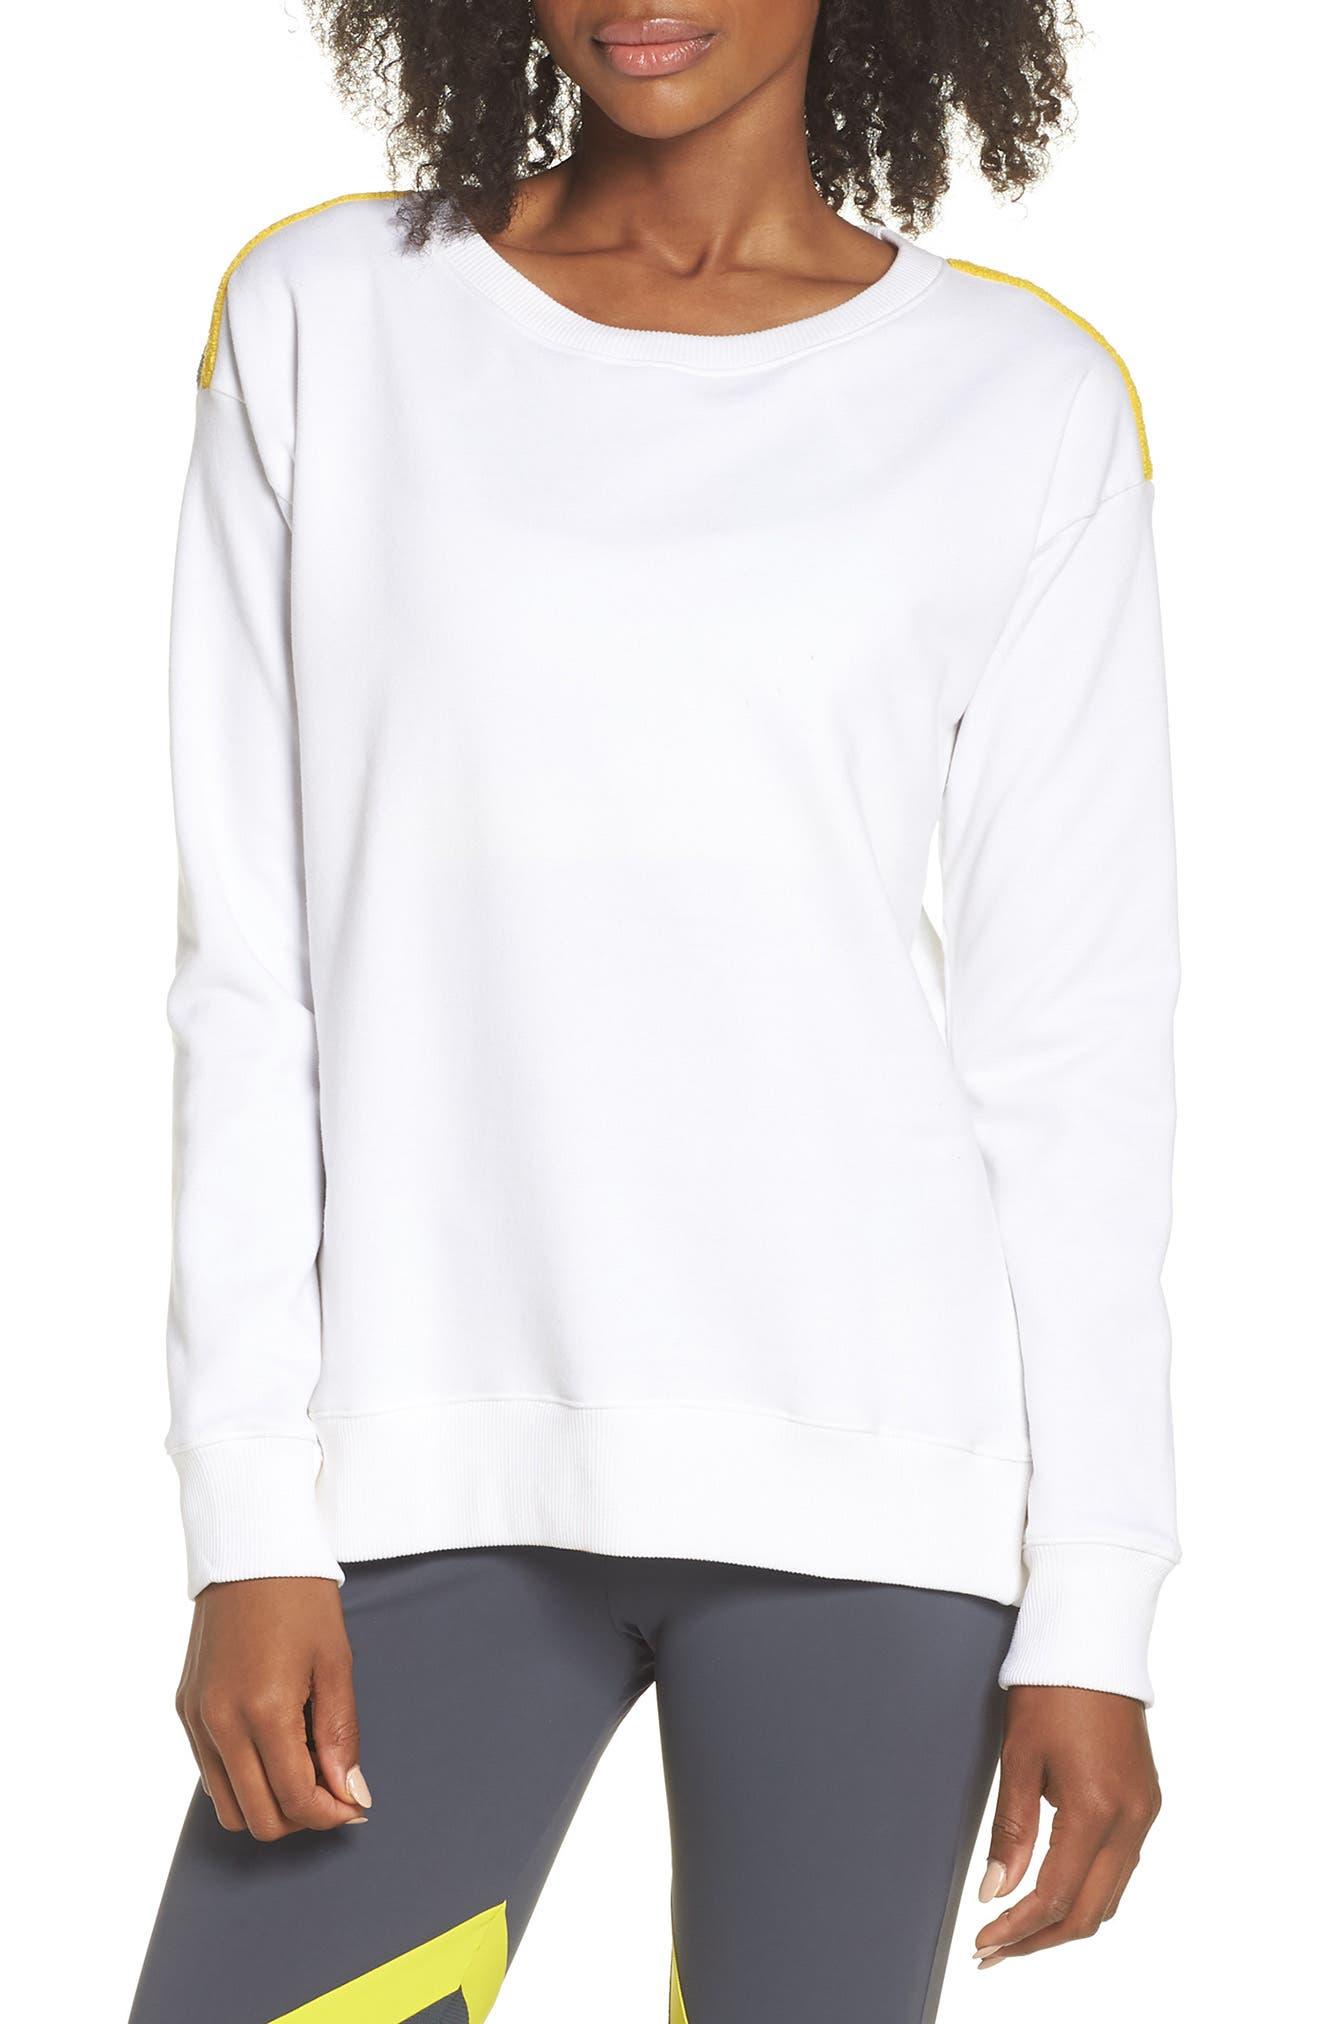 BoomBoom Athletica Tricolor Shoulder Sweatshirt,                             Main thumbnail 1, color,                             WHITE/ GREY/ YELLOW